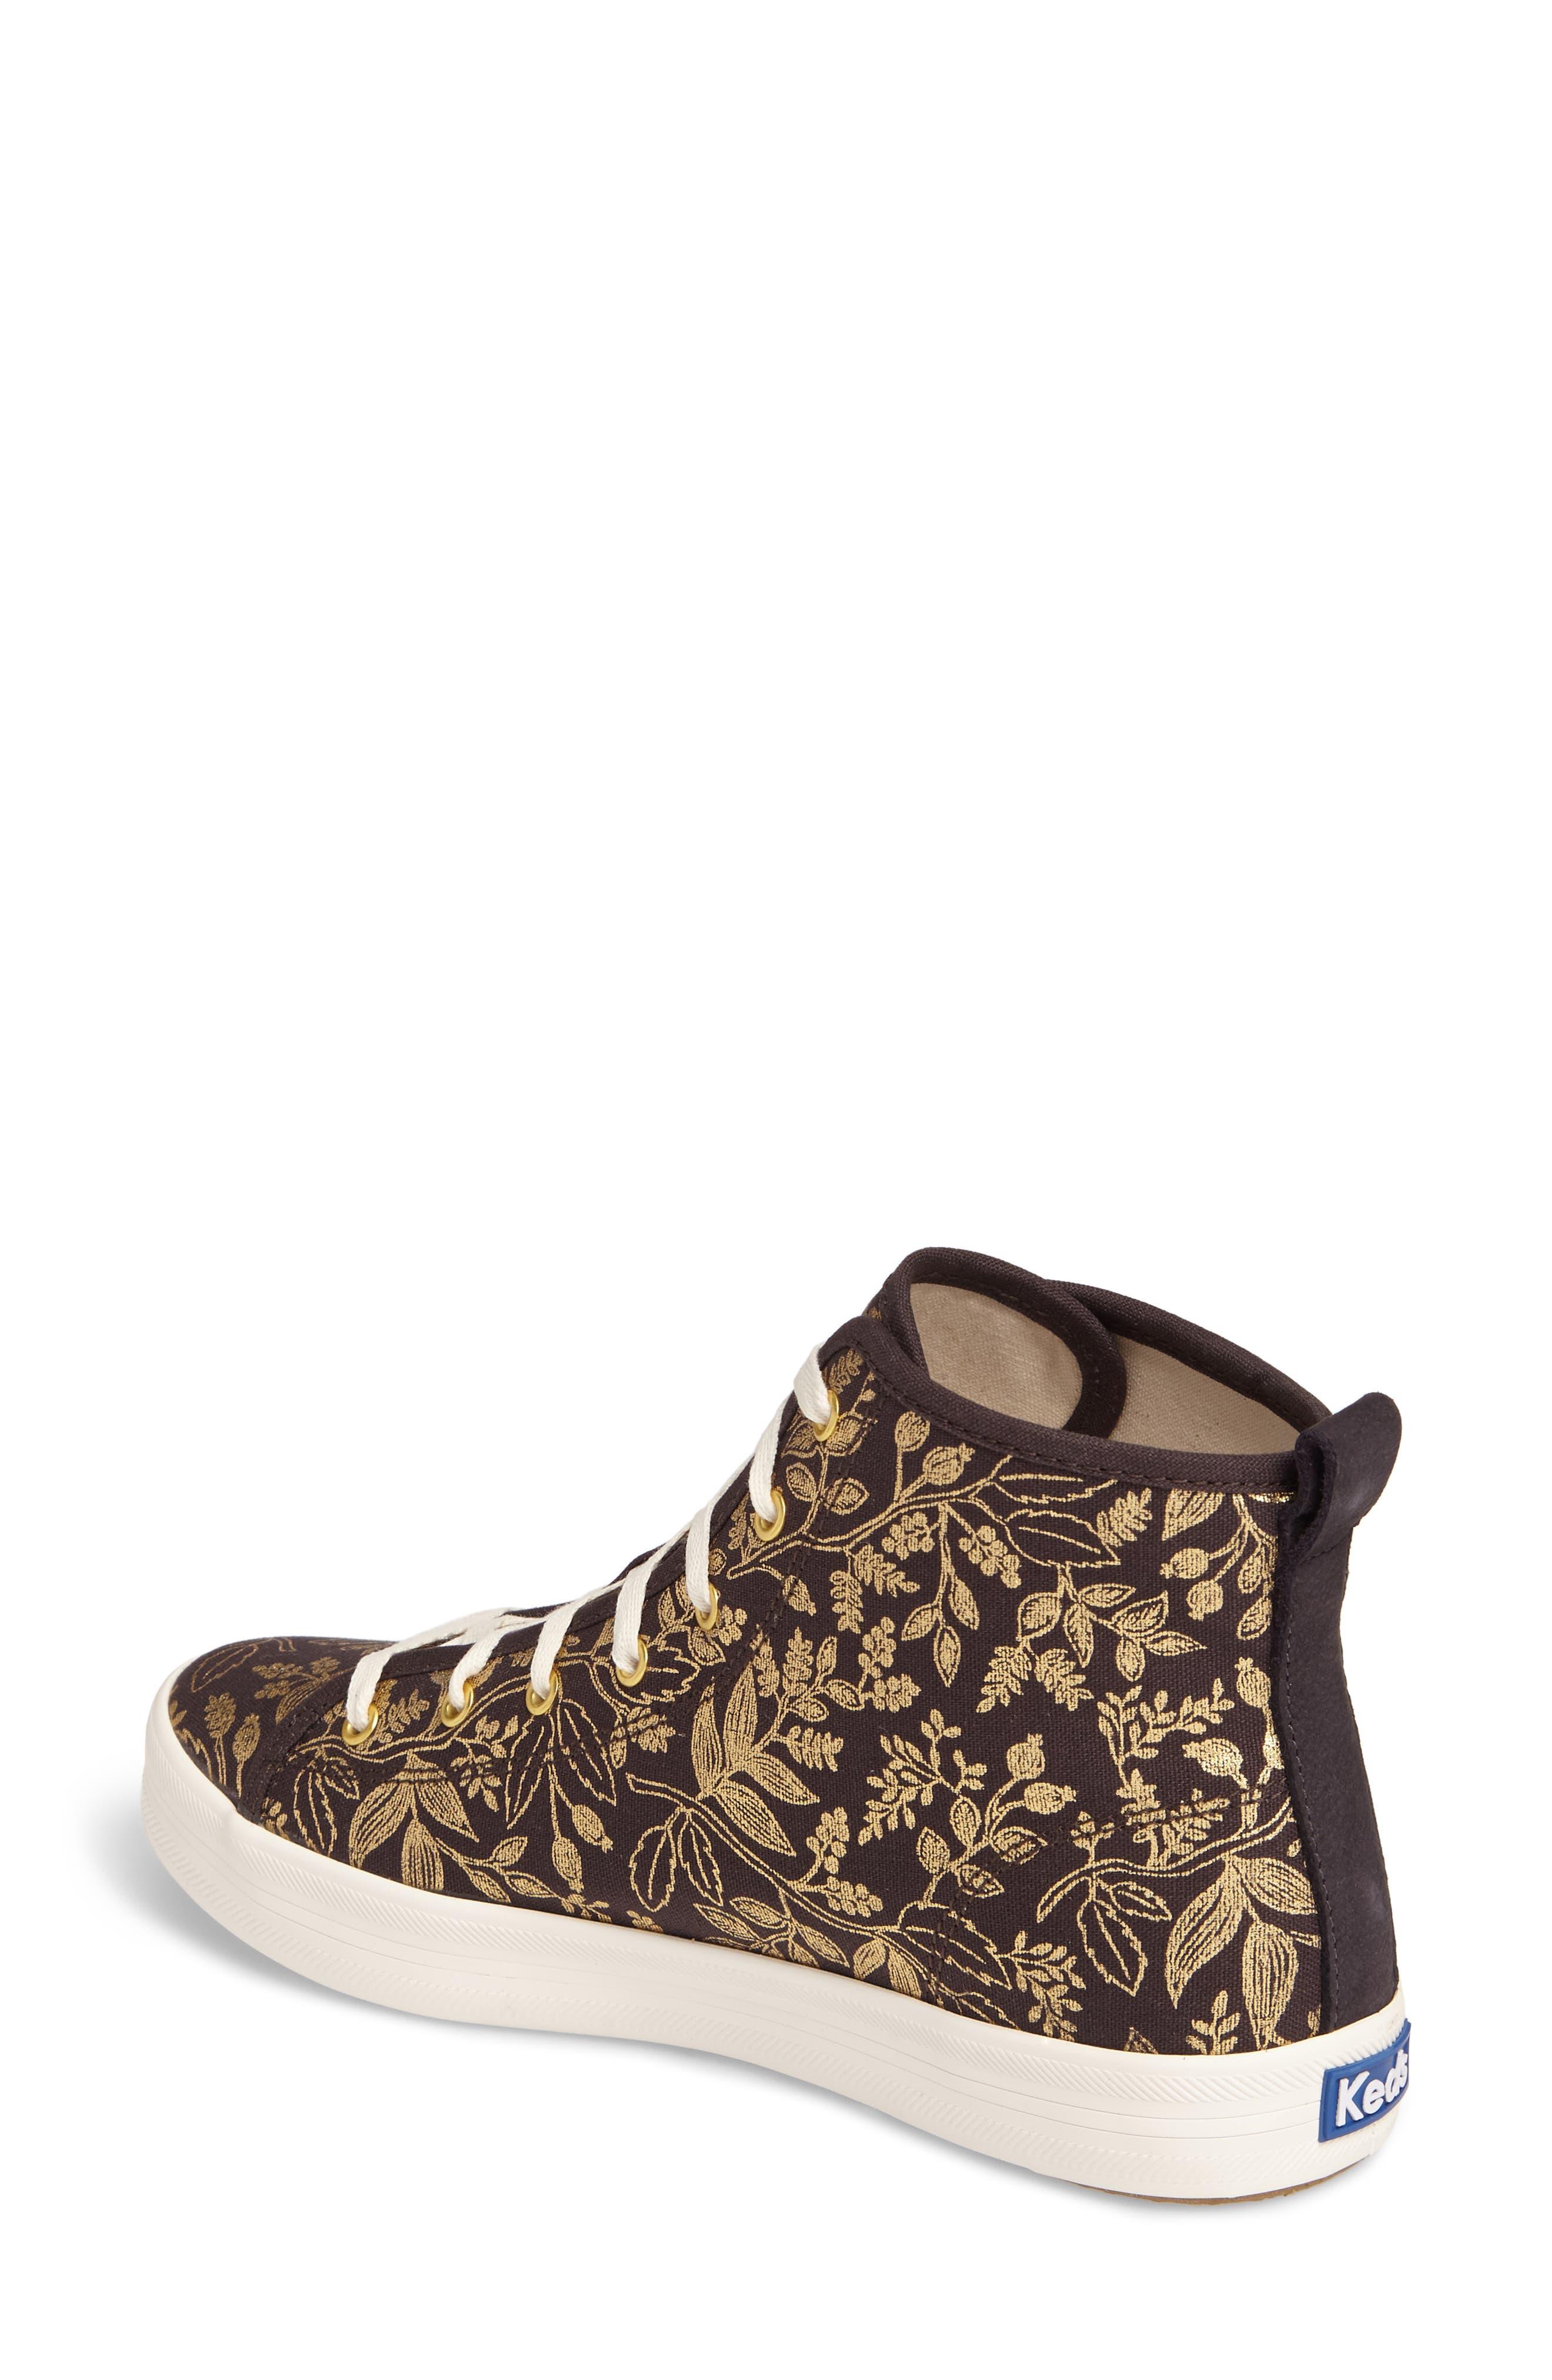 Alternate Image 2  - Keds® x Rifle Paper Co. Queen Anne High Top Sneaker (Women)